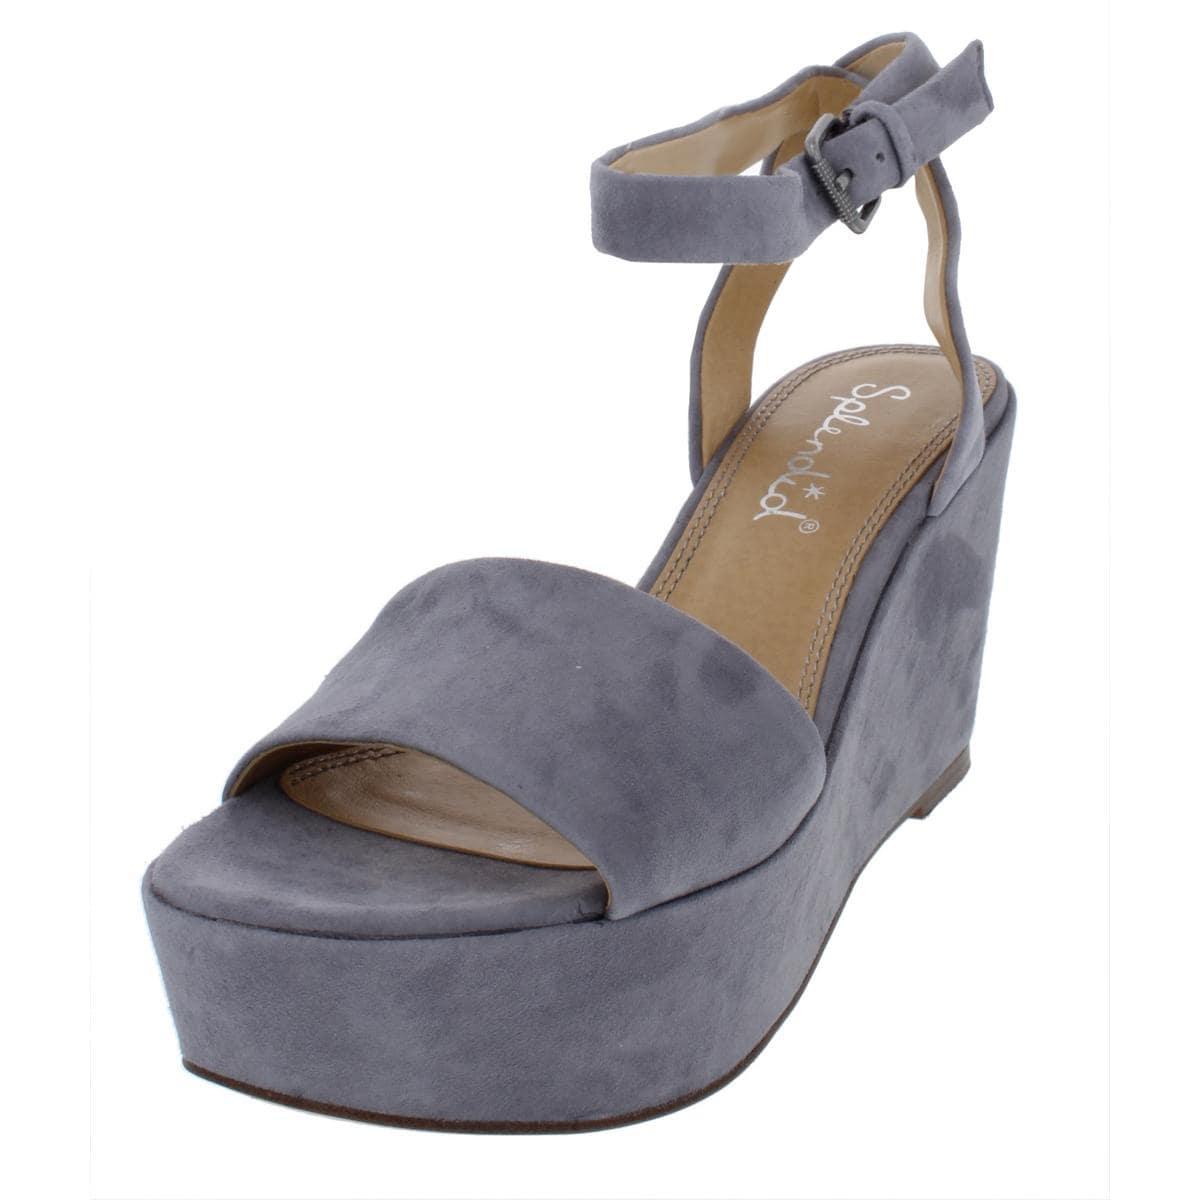 7eeeb5ad2983 Shop Splendid Womens Felix Platform Sandals Suede Wedge - Free Shipping  Today - Overstock - 26879646